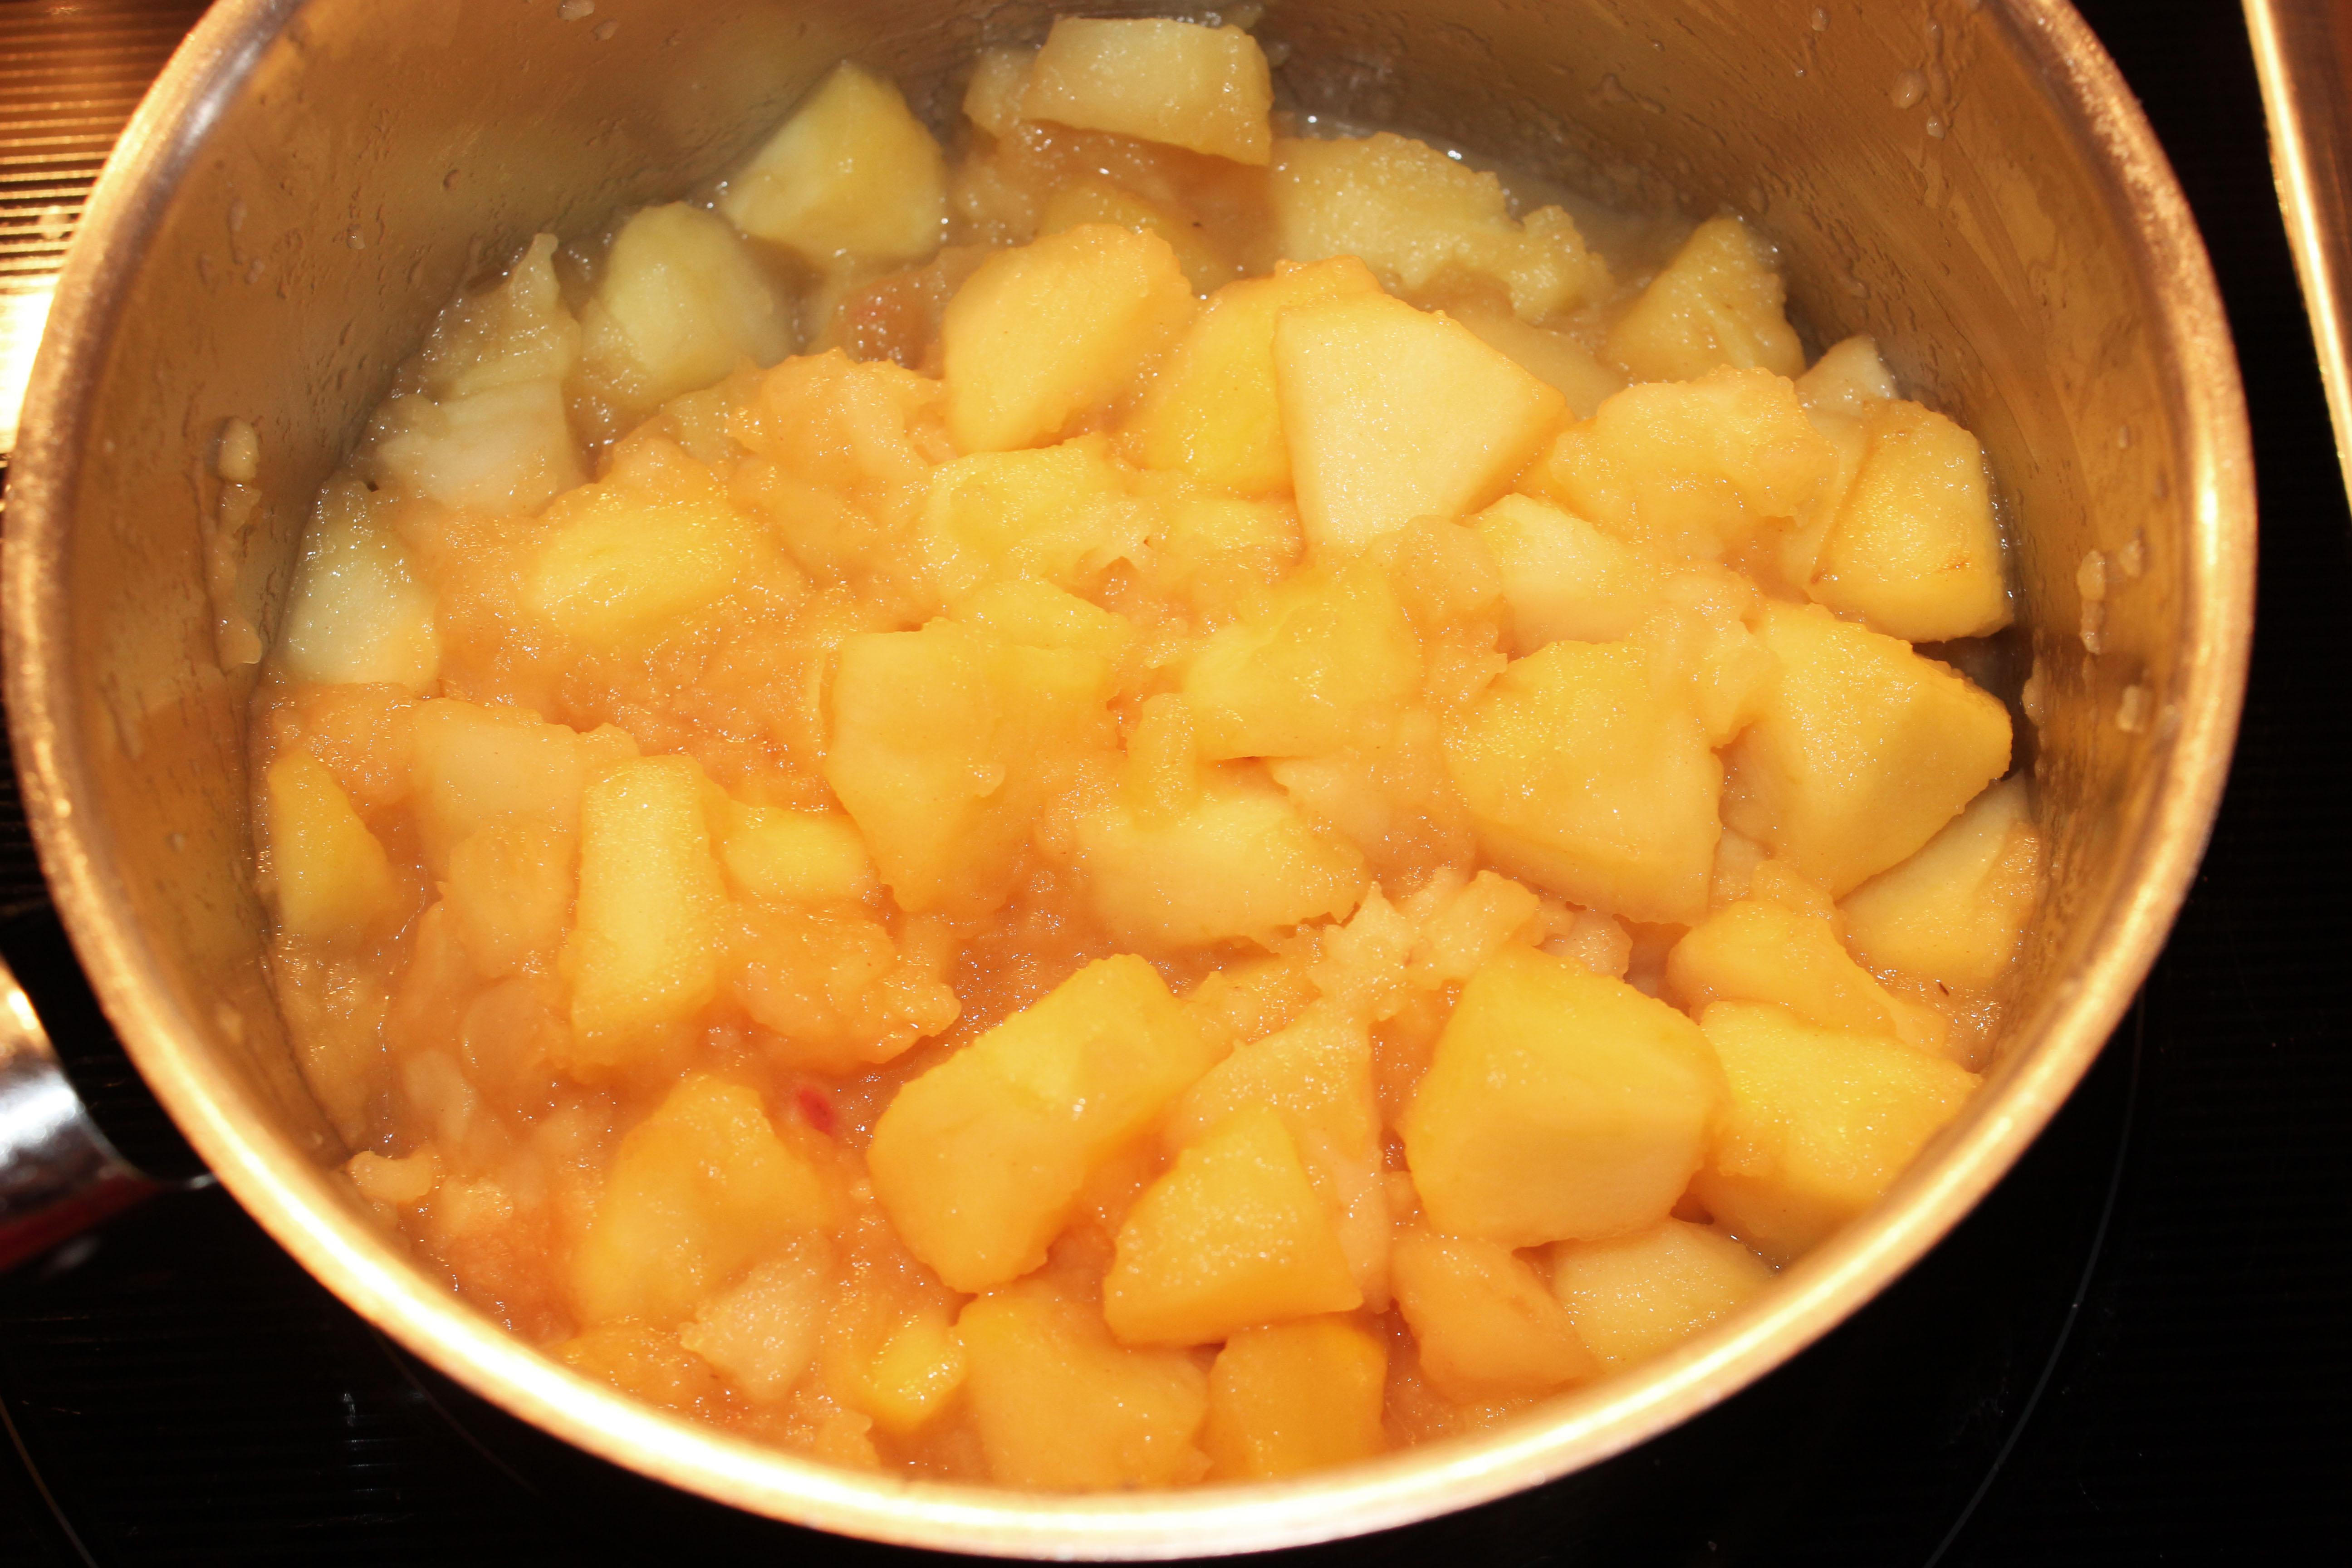 Karamell-Apfel-Cheesecake_4385_bearbeitet-1